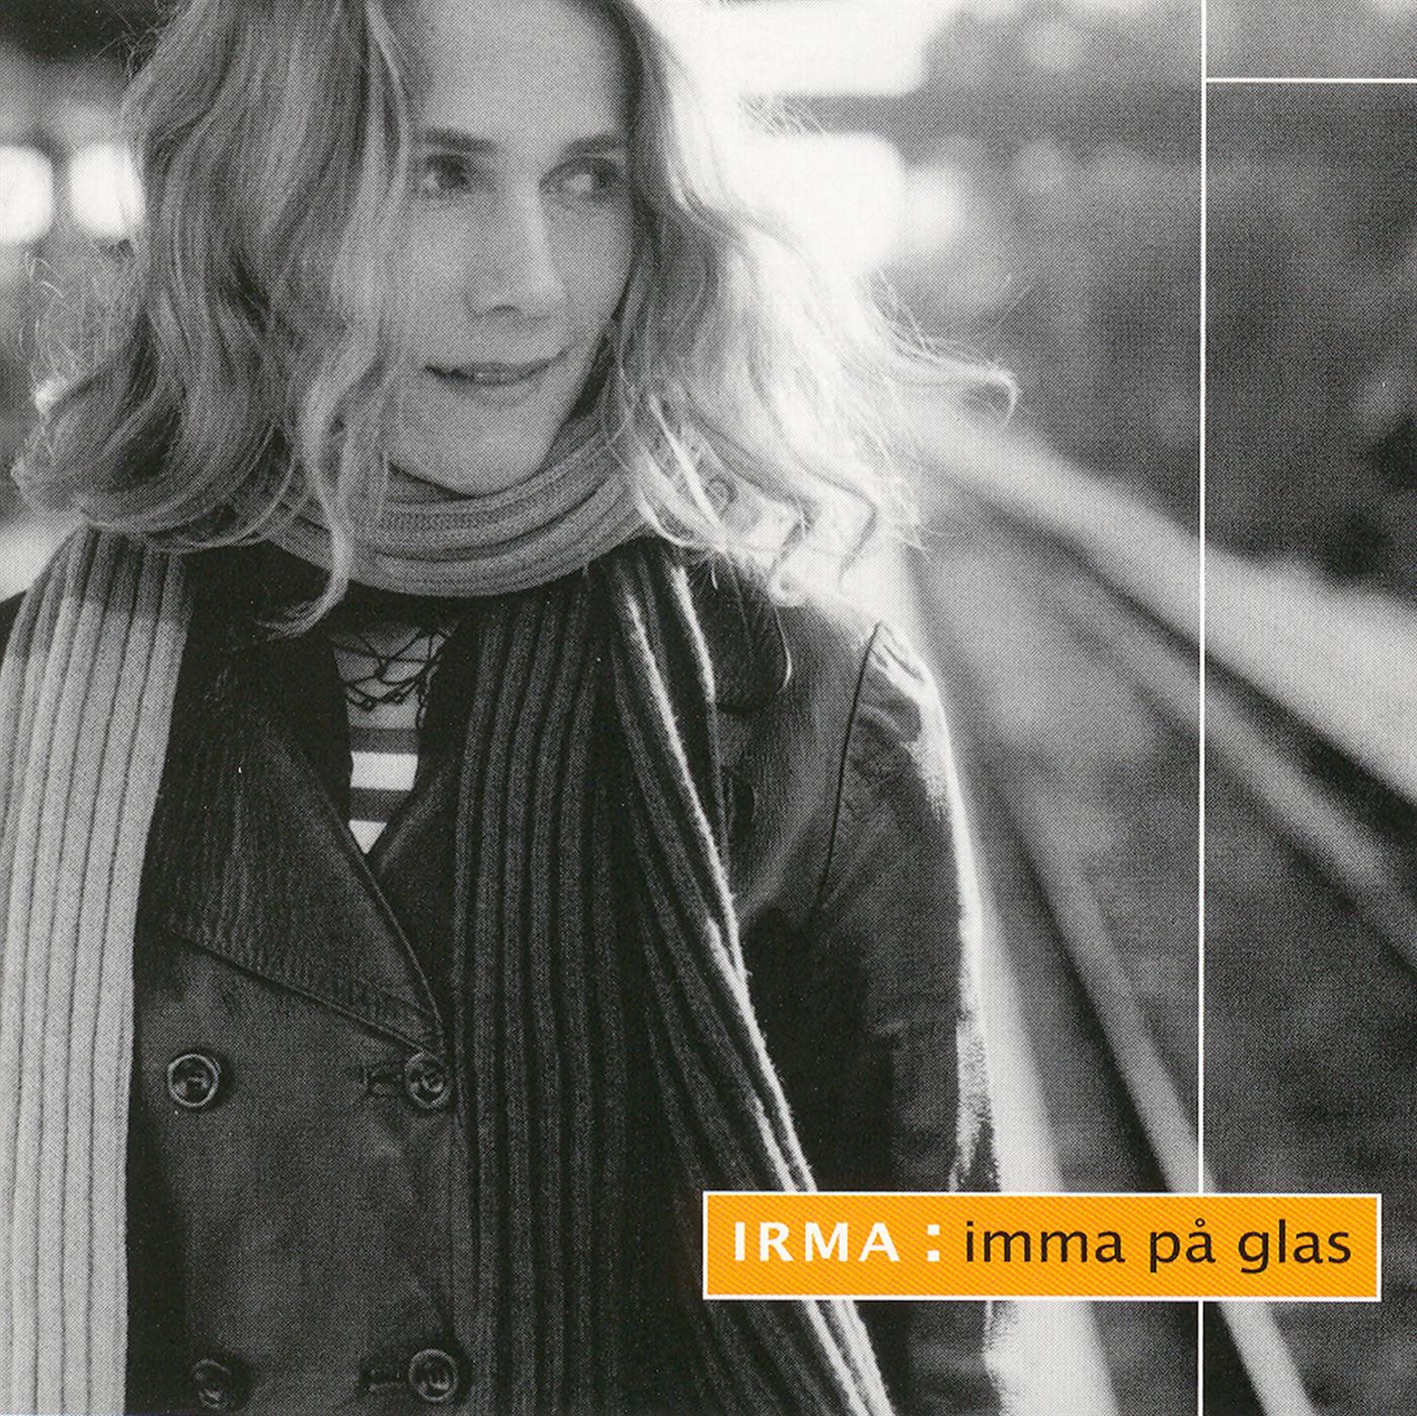 Irma album Imma på glas